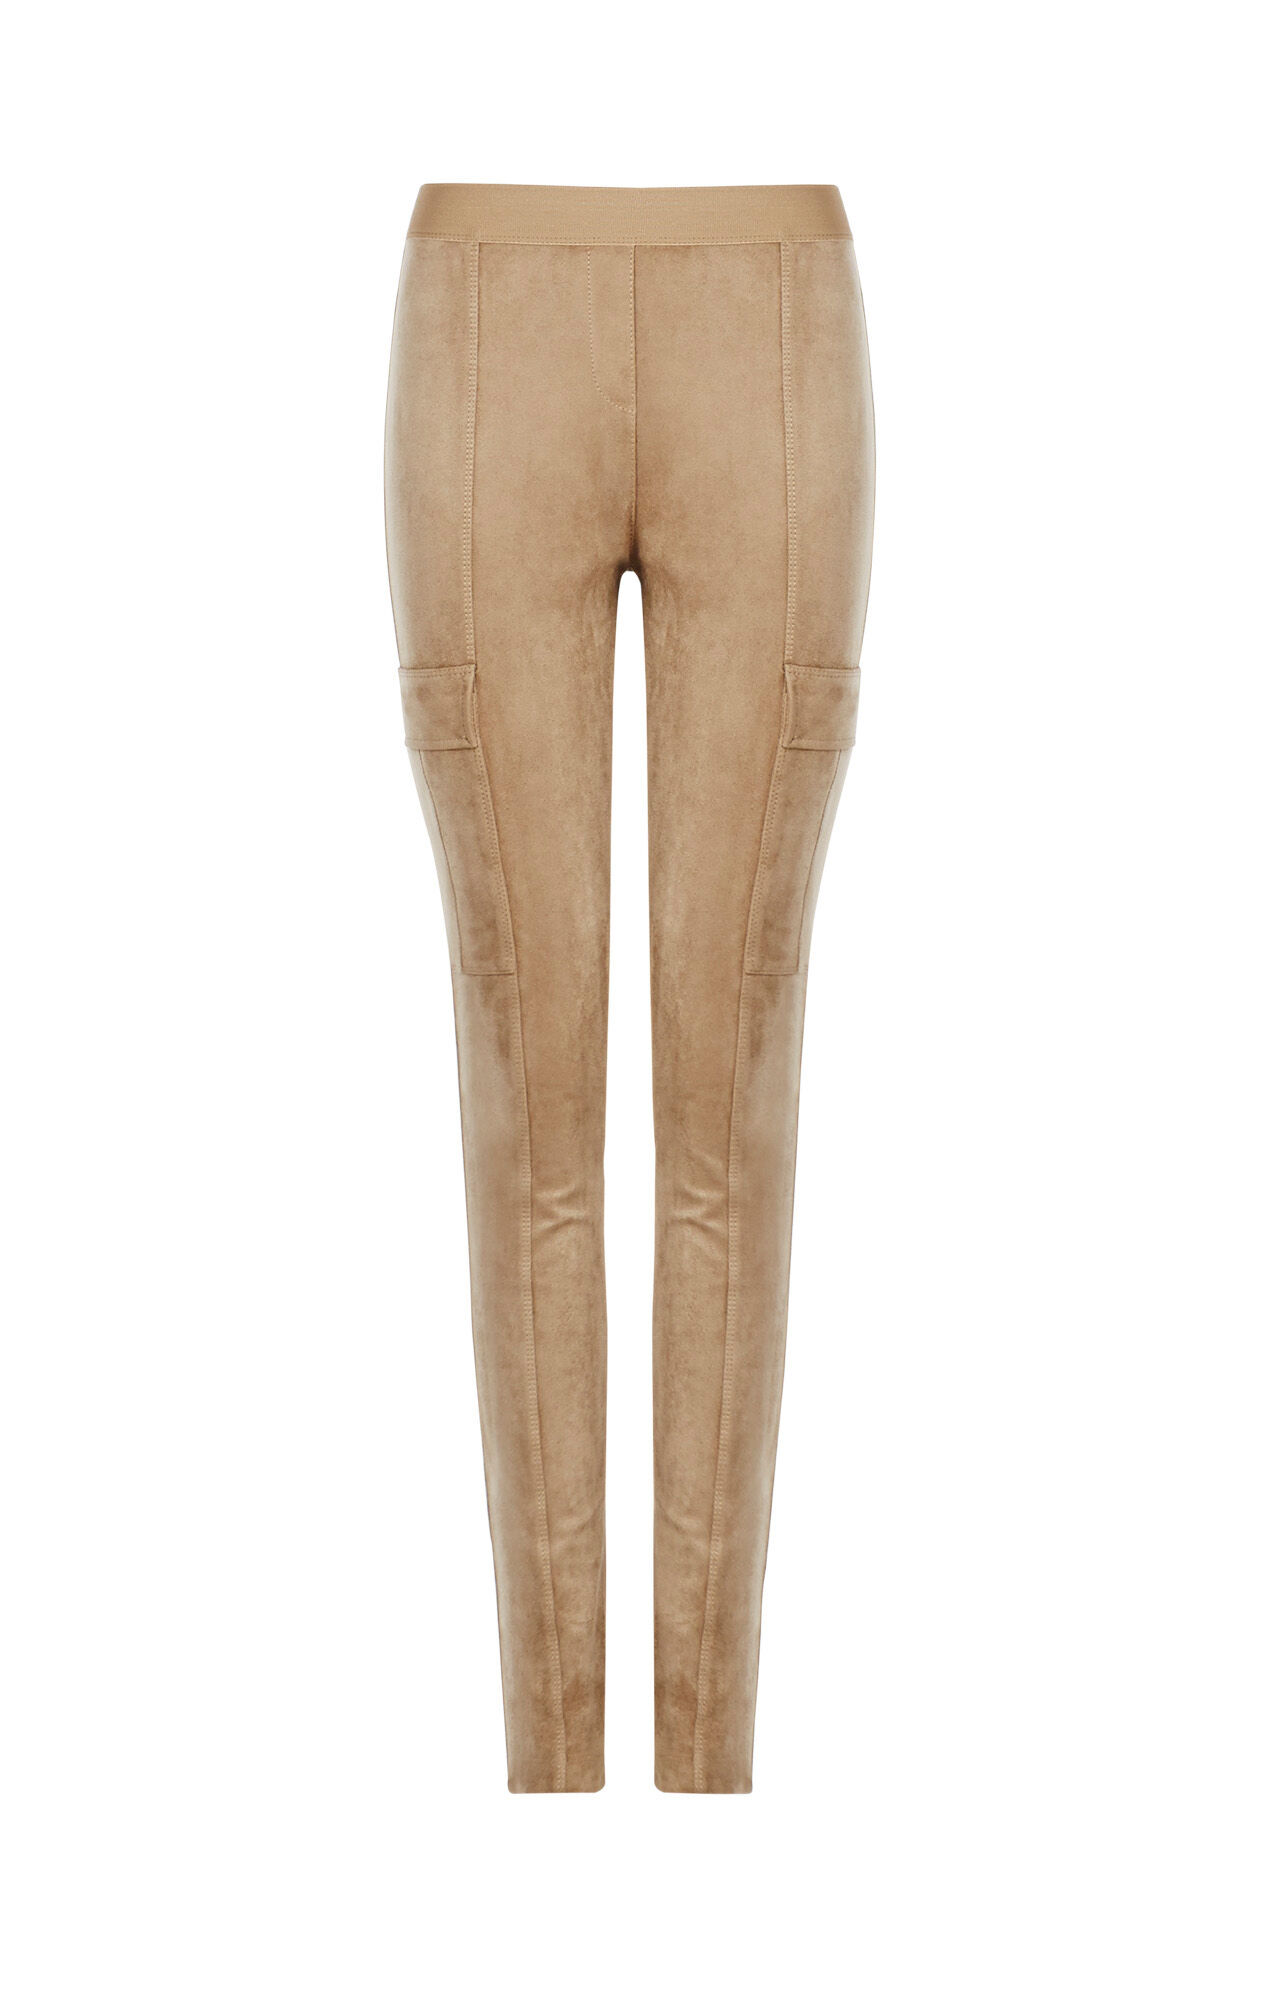 Wilcox Faux-Suede Legging